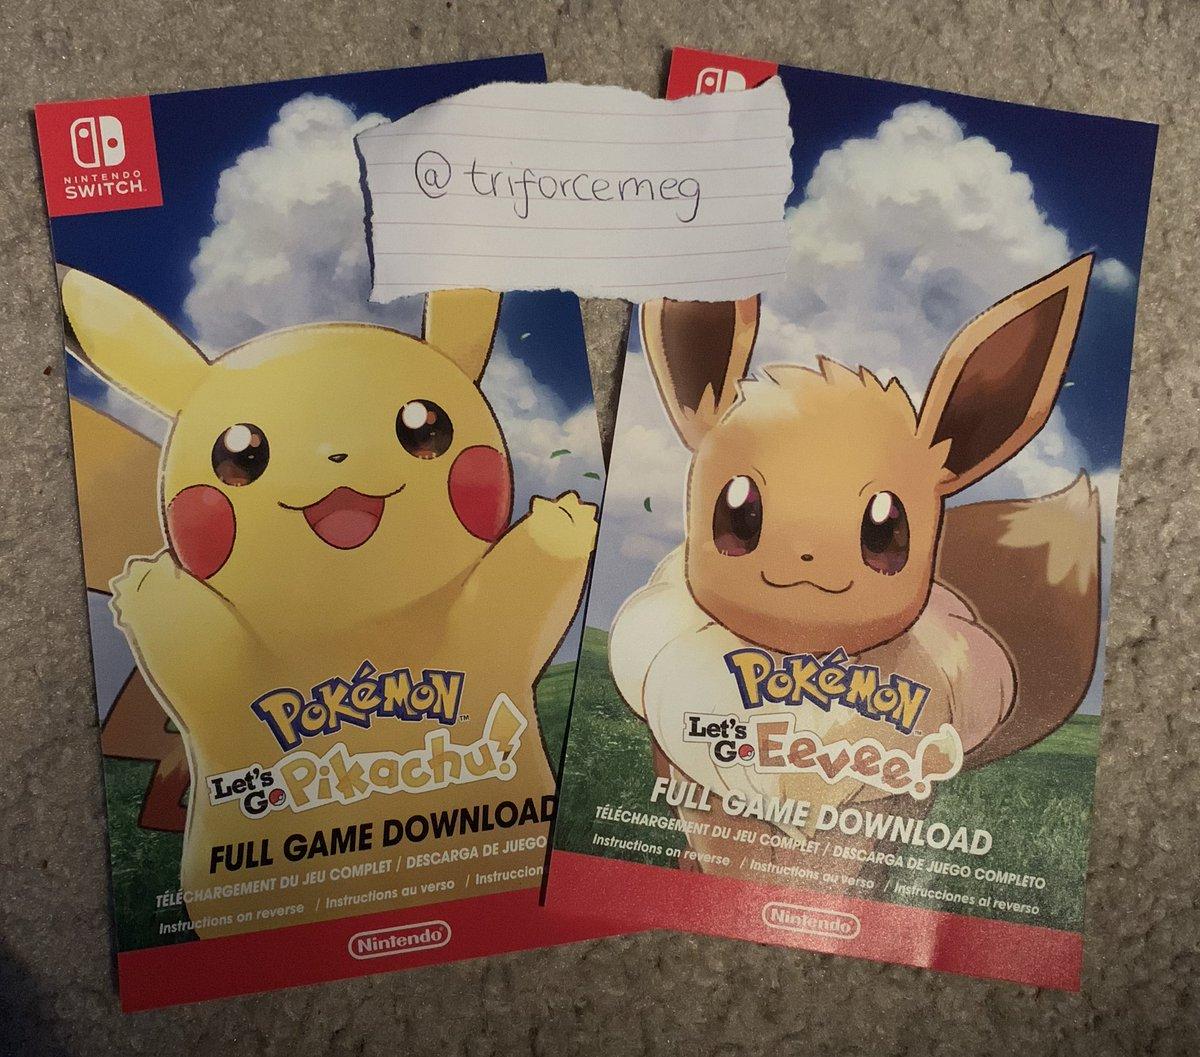 pokemon lets go pikachu full game download